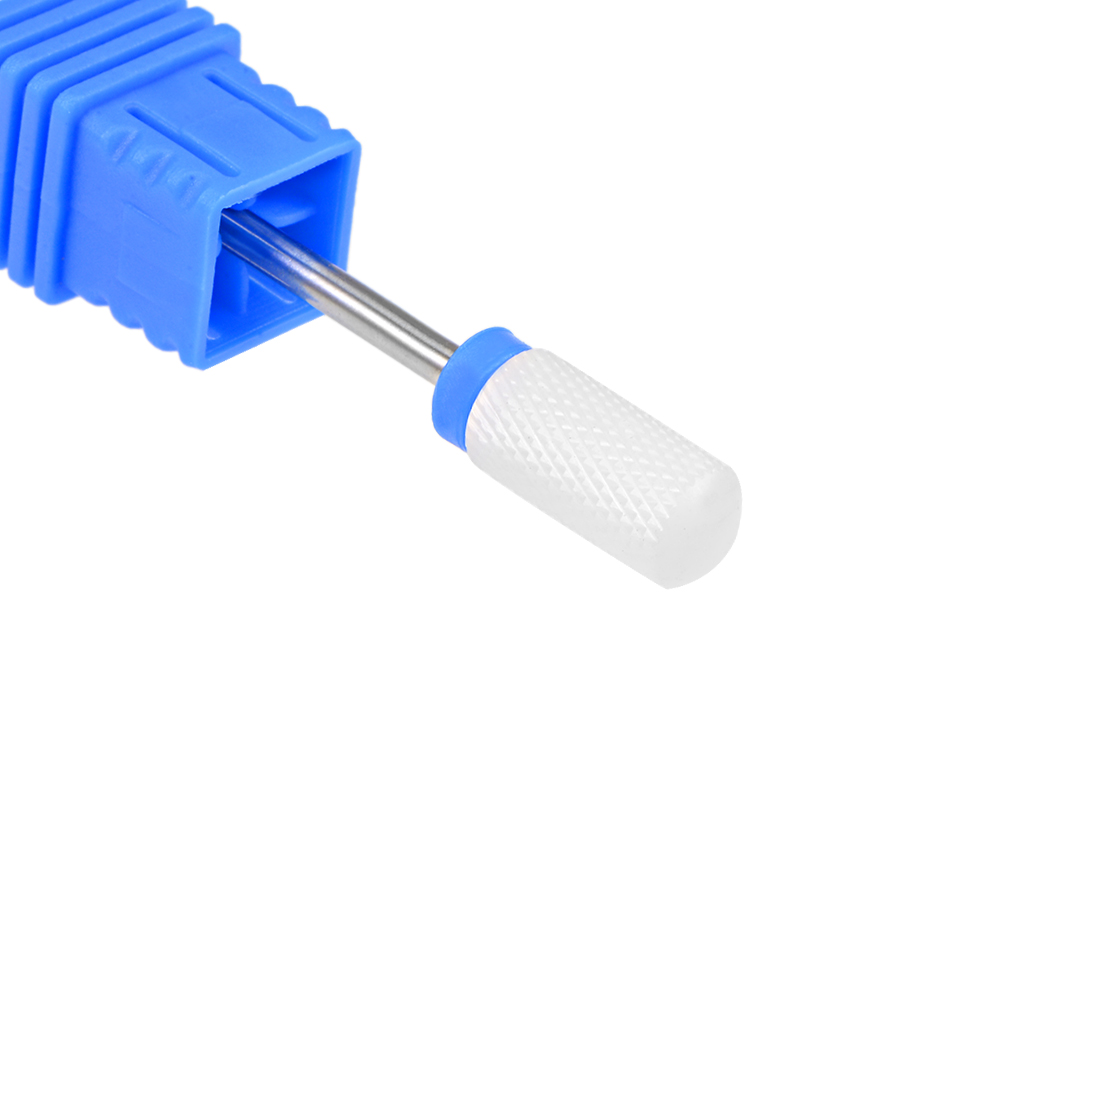 "Ceramic Nail Drill Bits 3/32"" (Medium Grit) Acrylic Cuticle Nails File Bit Blue"